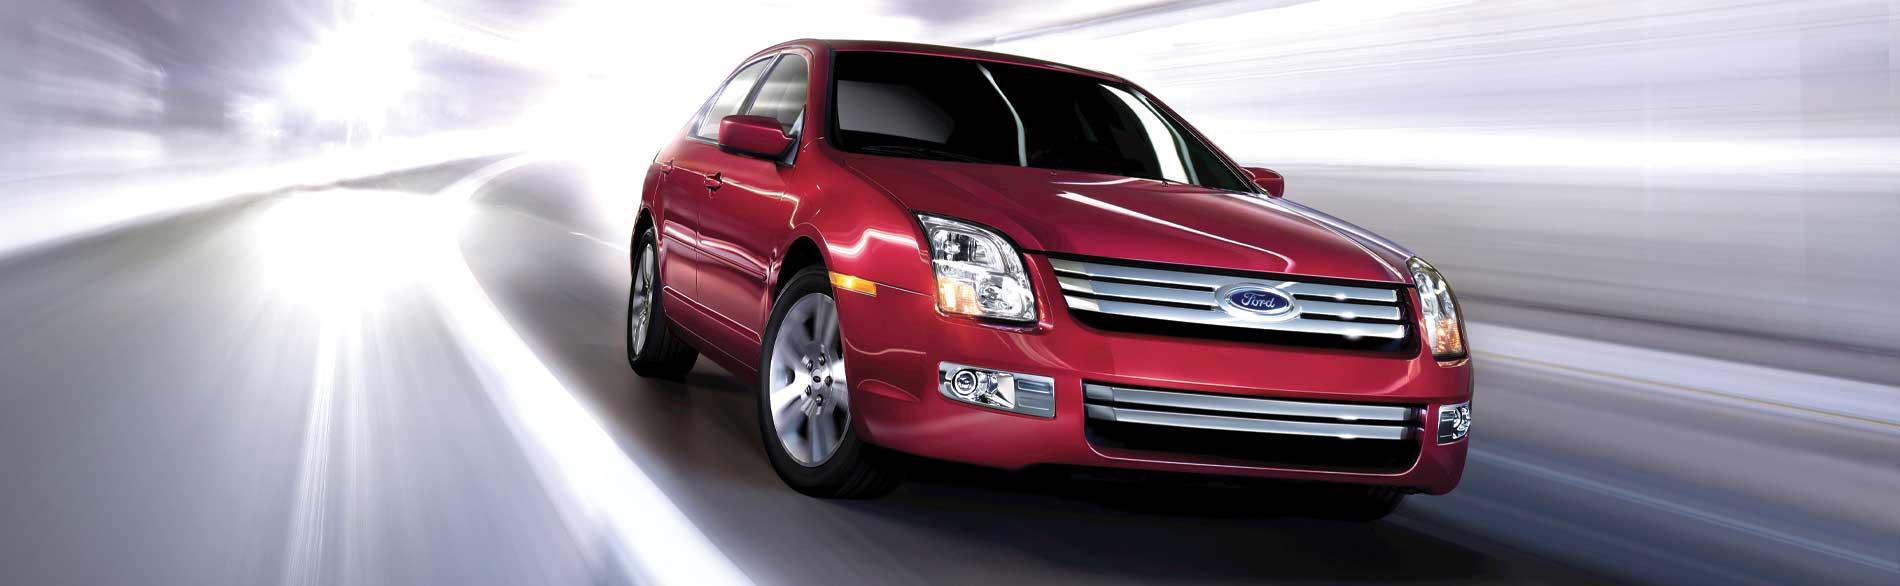 Green Light Auto >> Green Light Auto Sales Car Dealer In Virginia Beach Va